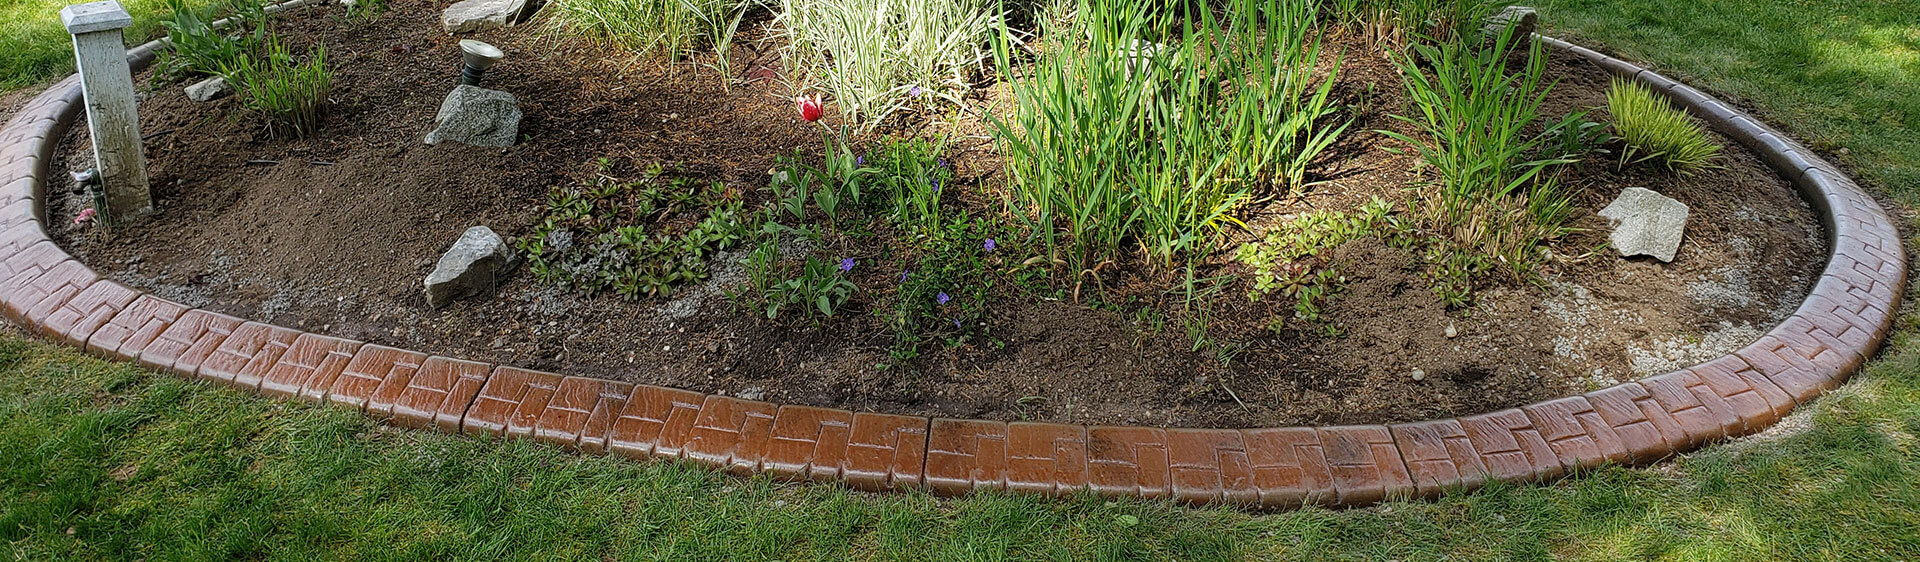 Surrey Concrete Curbing, Landscape Curbing and Curb Repairs